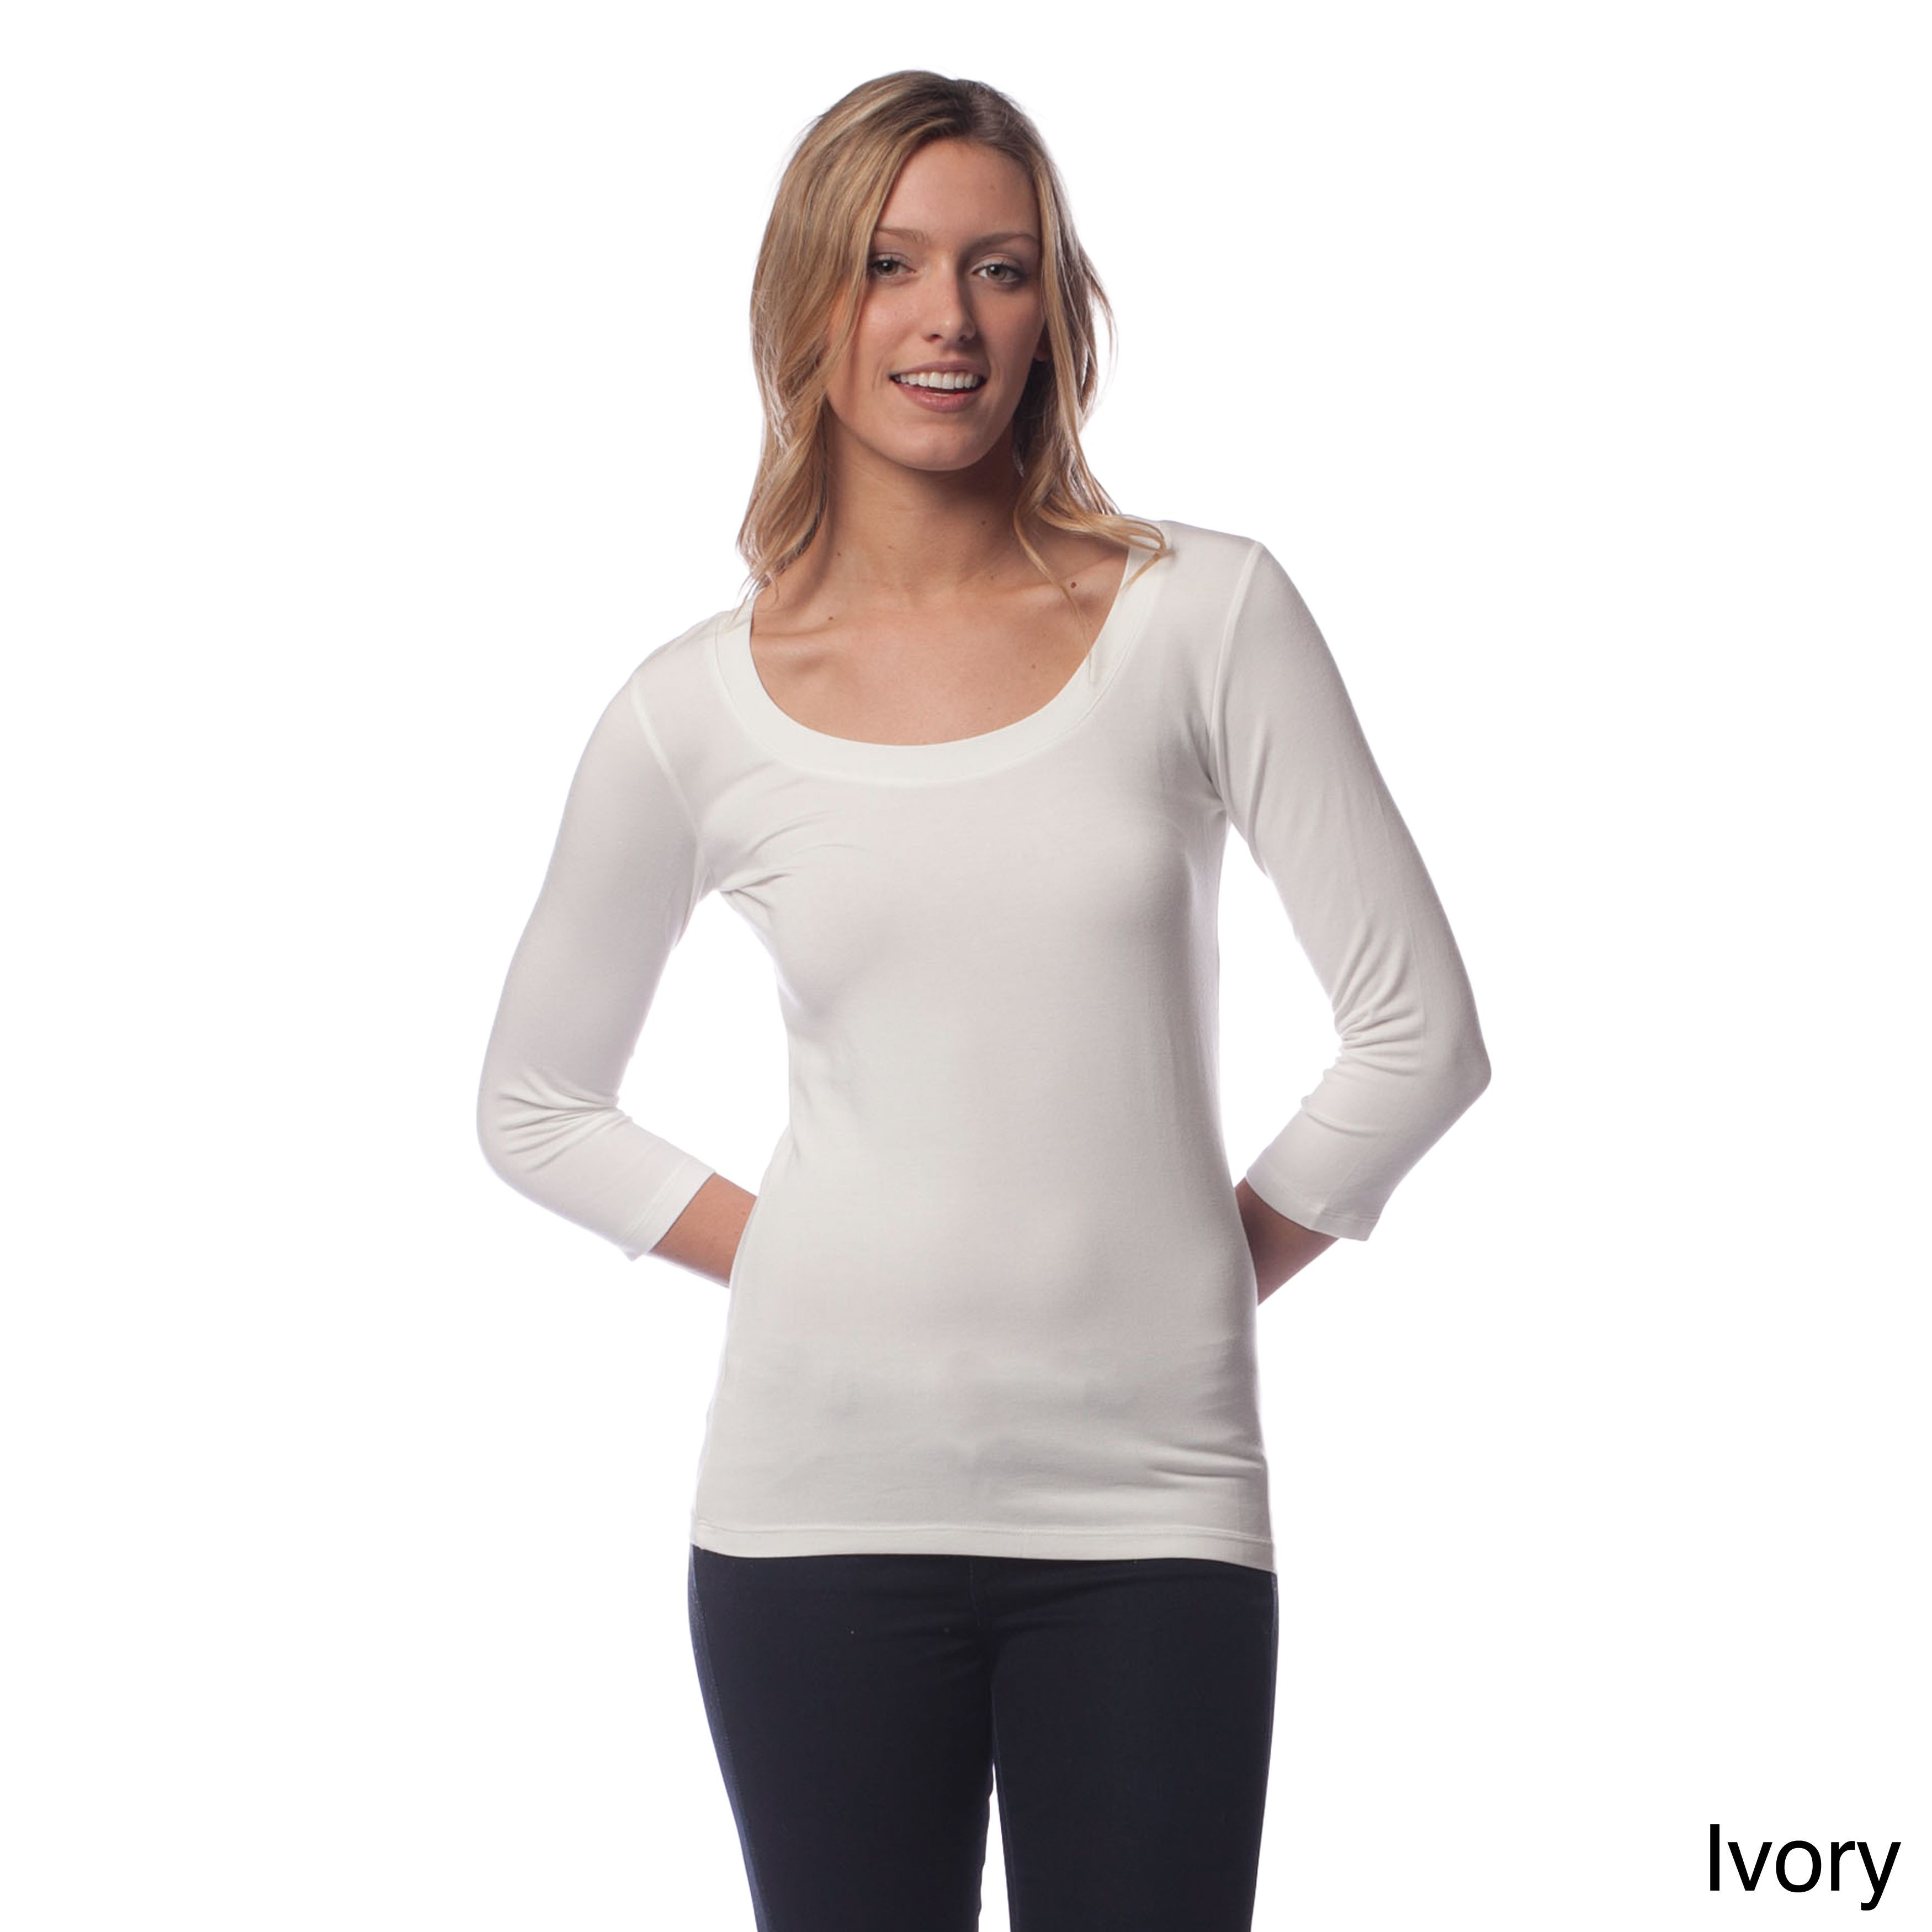 AtoZ Women's Modal 3/4 Sleeve Scoop Neck Top